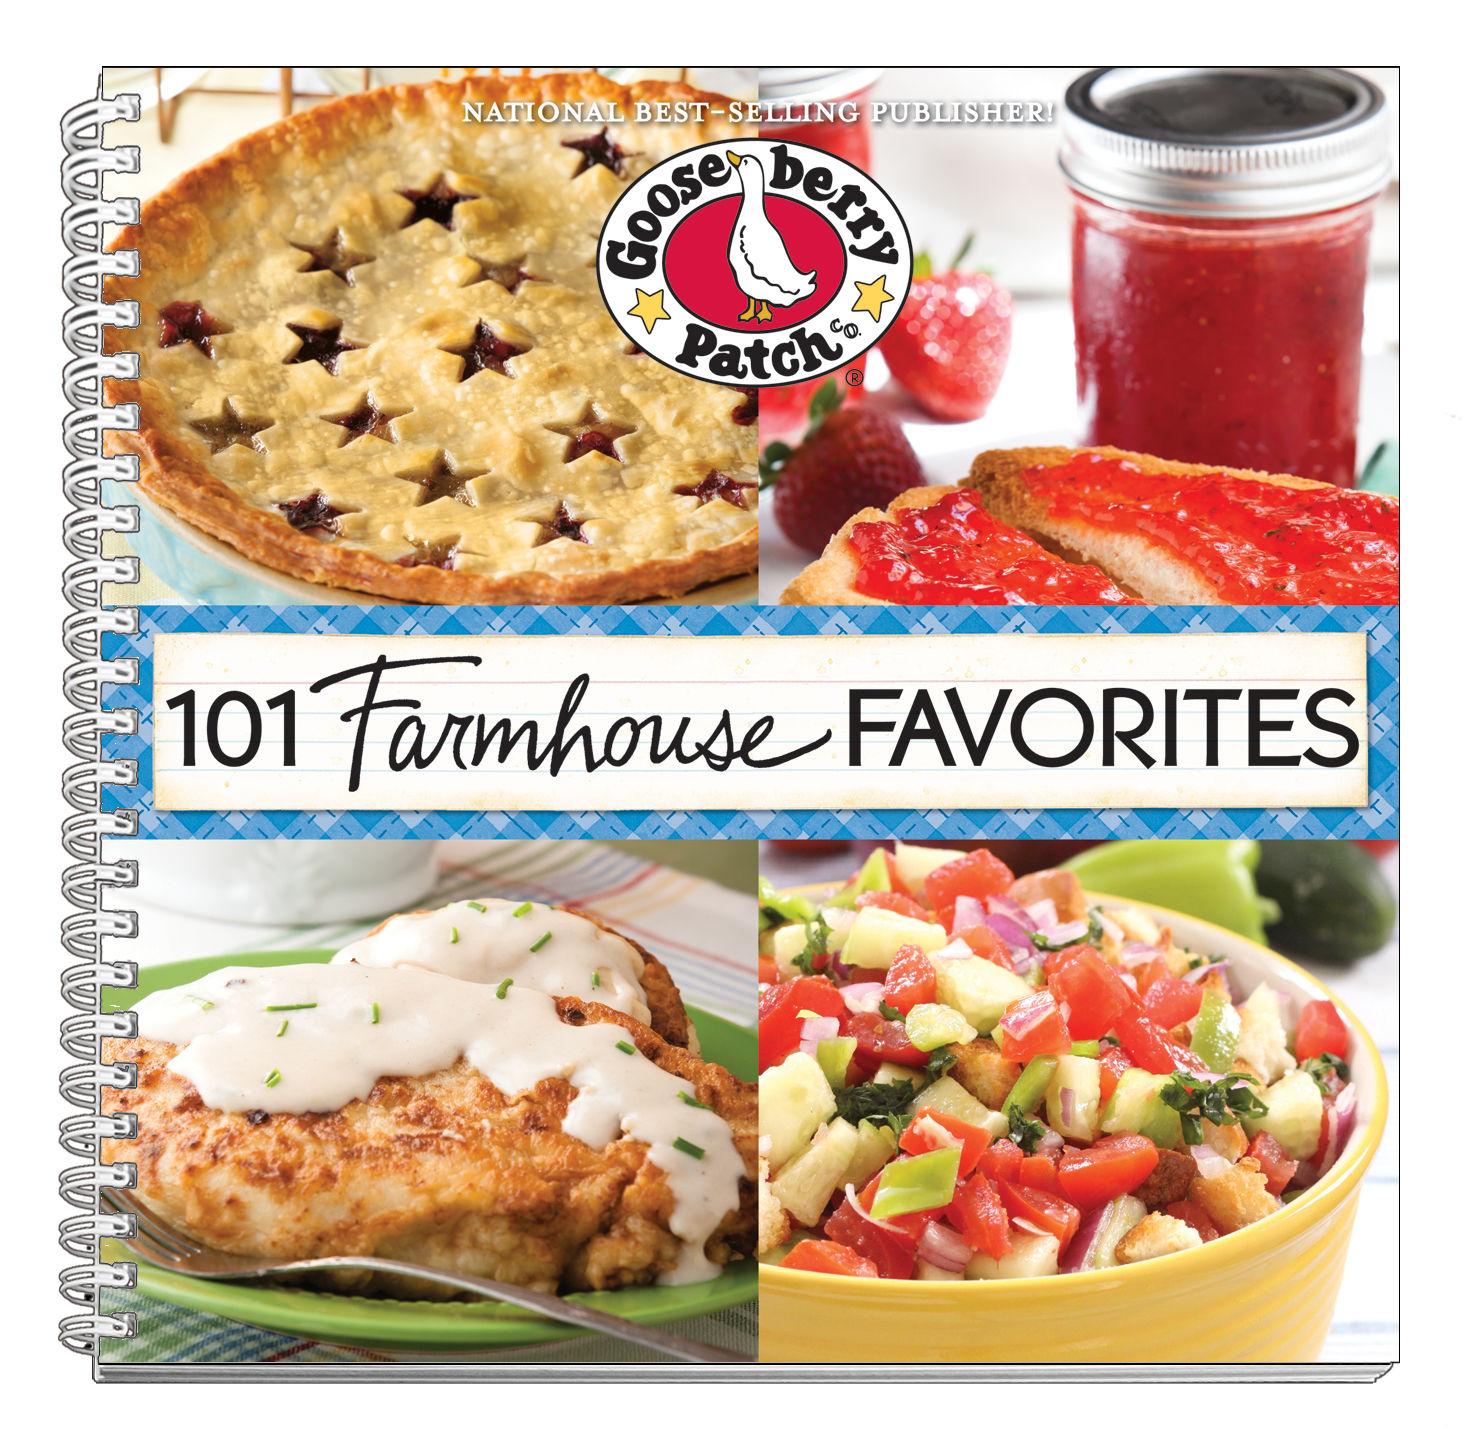 101 Farmhouse Favorites Cookbook Giveaway The Farmwife Cooks